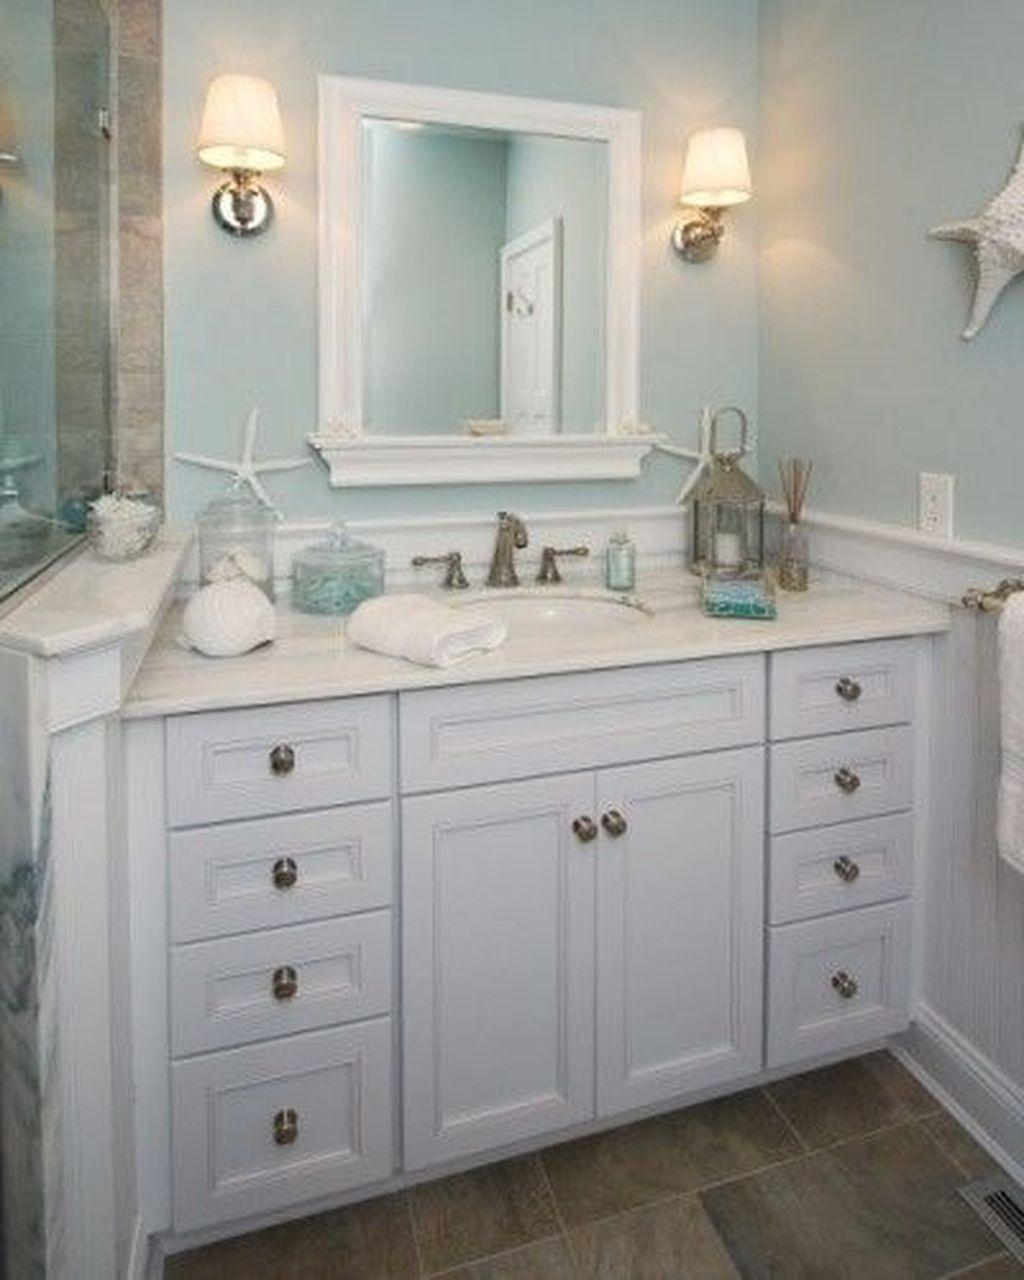 6 Blue Bathroom Ideas Soothing Looks Houseminds Cottage Bathroom Beach Theme Bathroom Traditional Bathroom